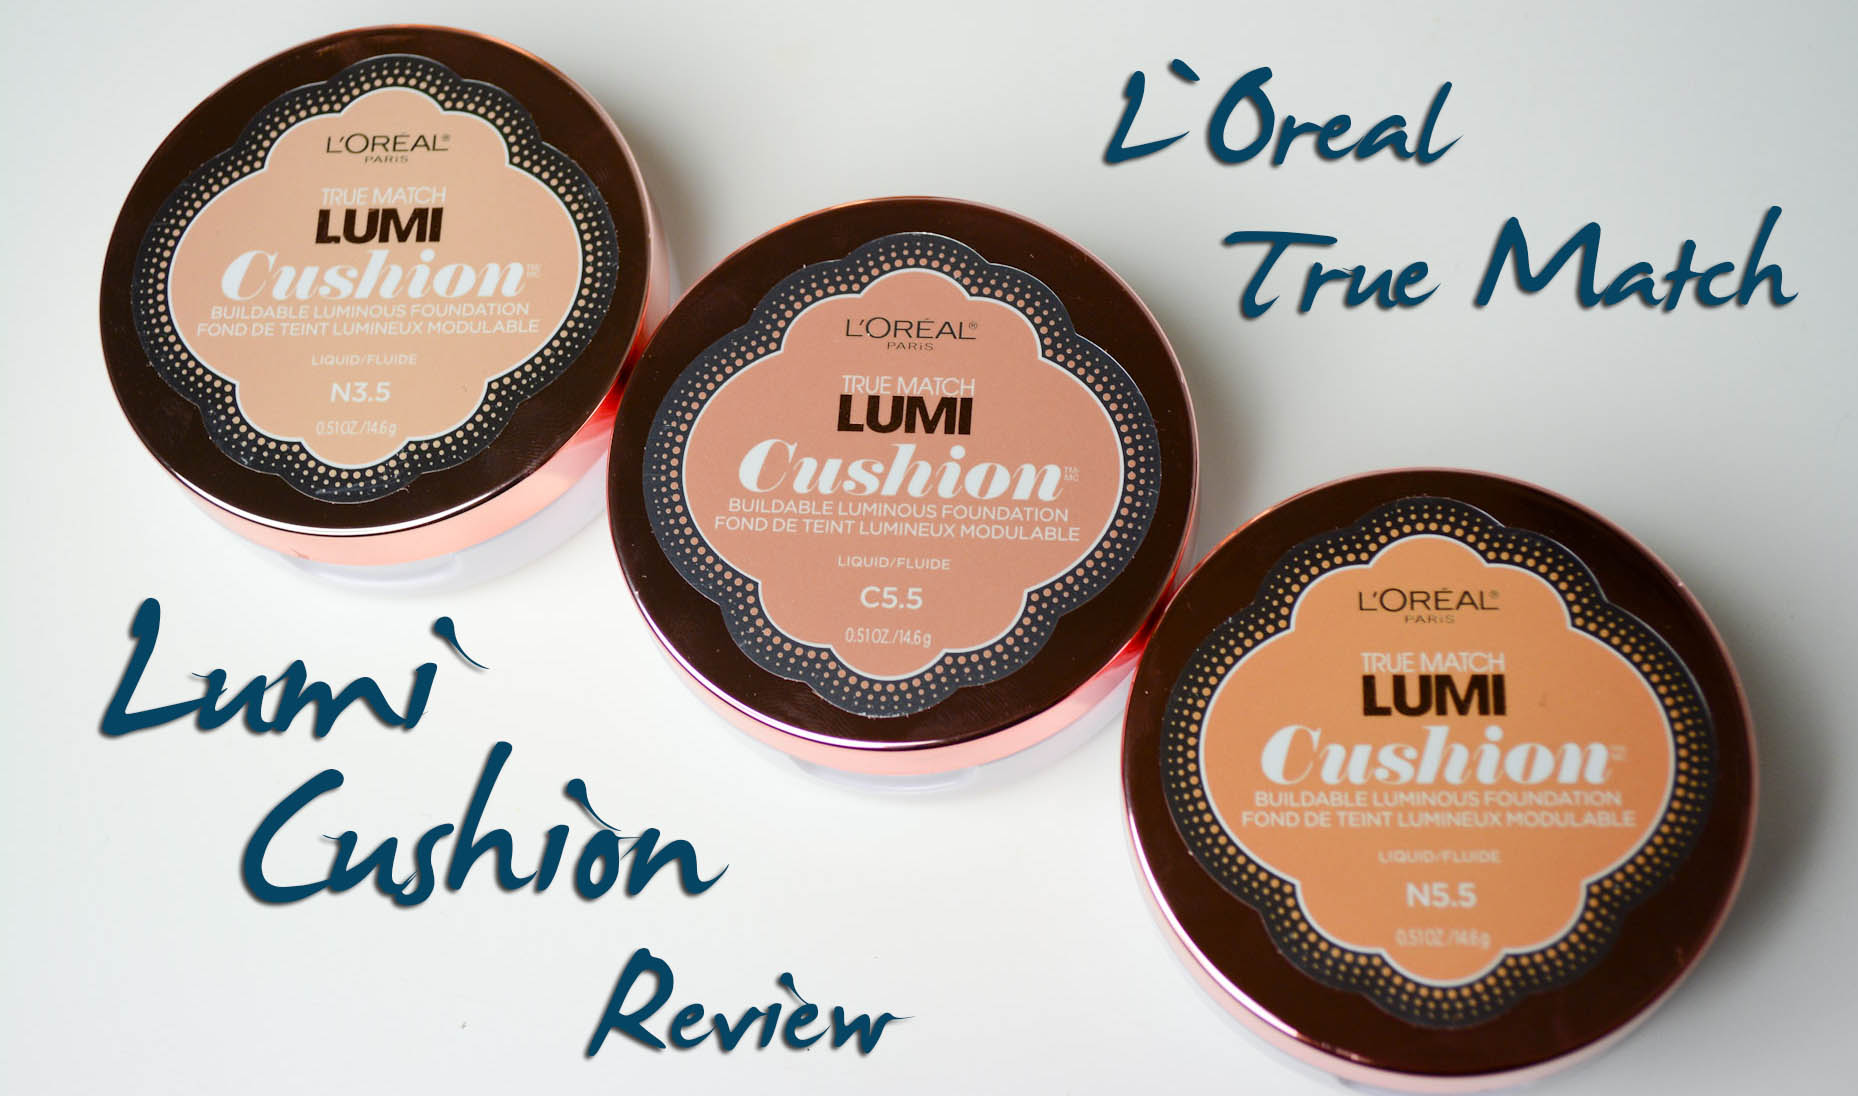 L'Oreal True Match Lumi Cushion Review   Lipstick Latitude